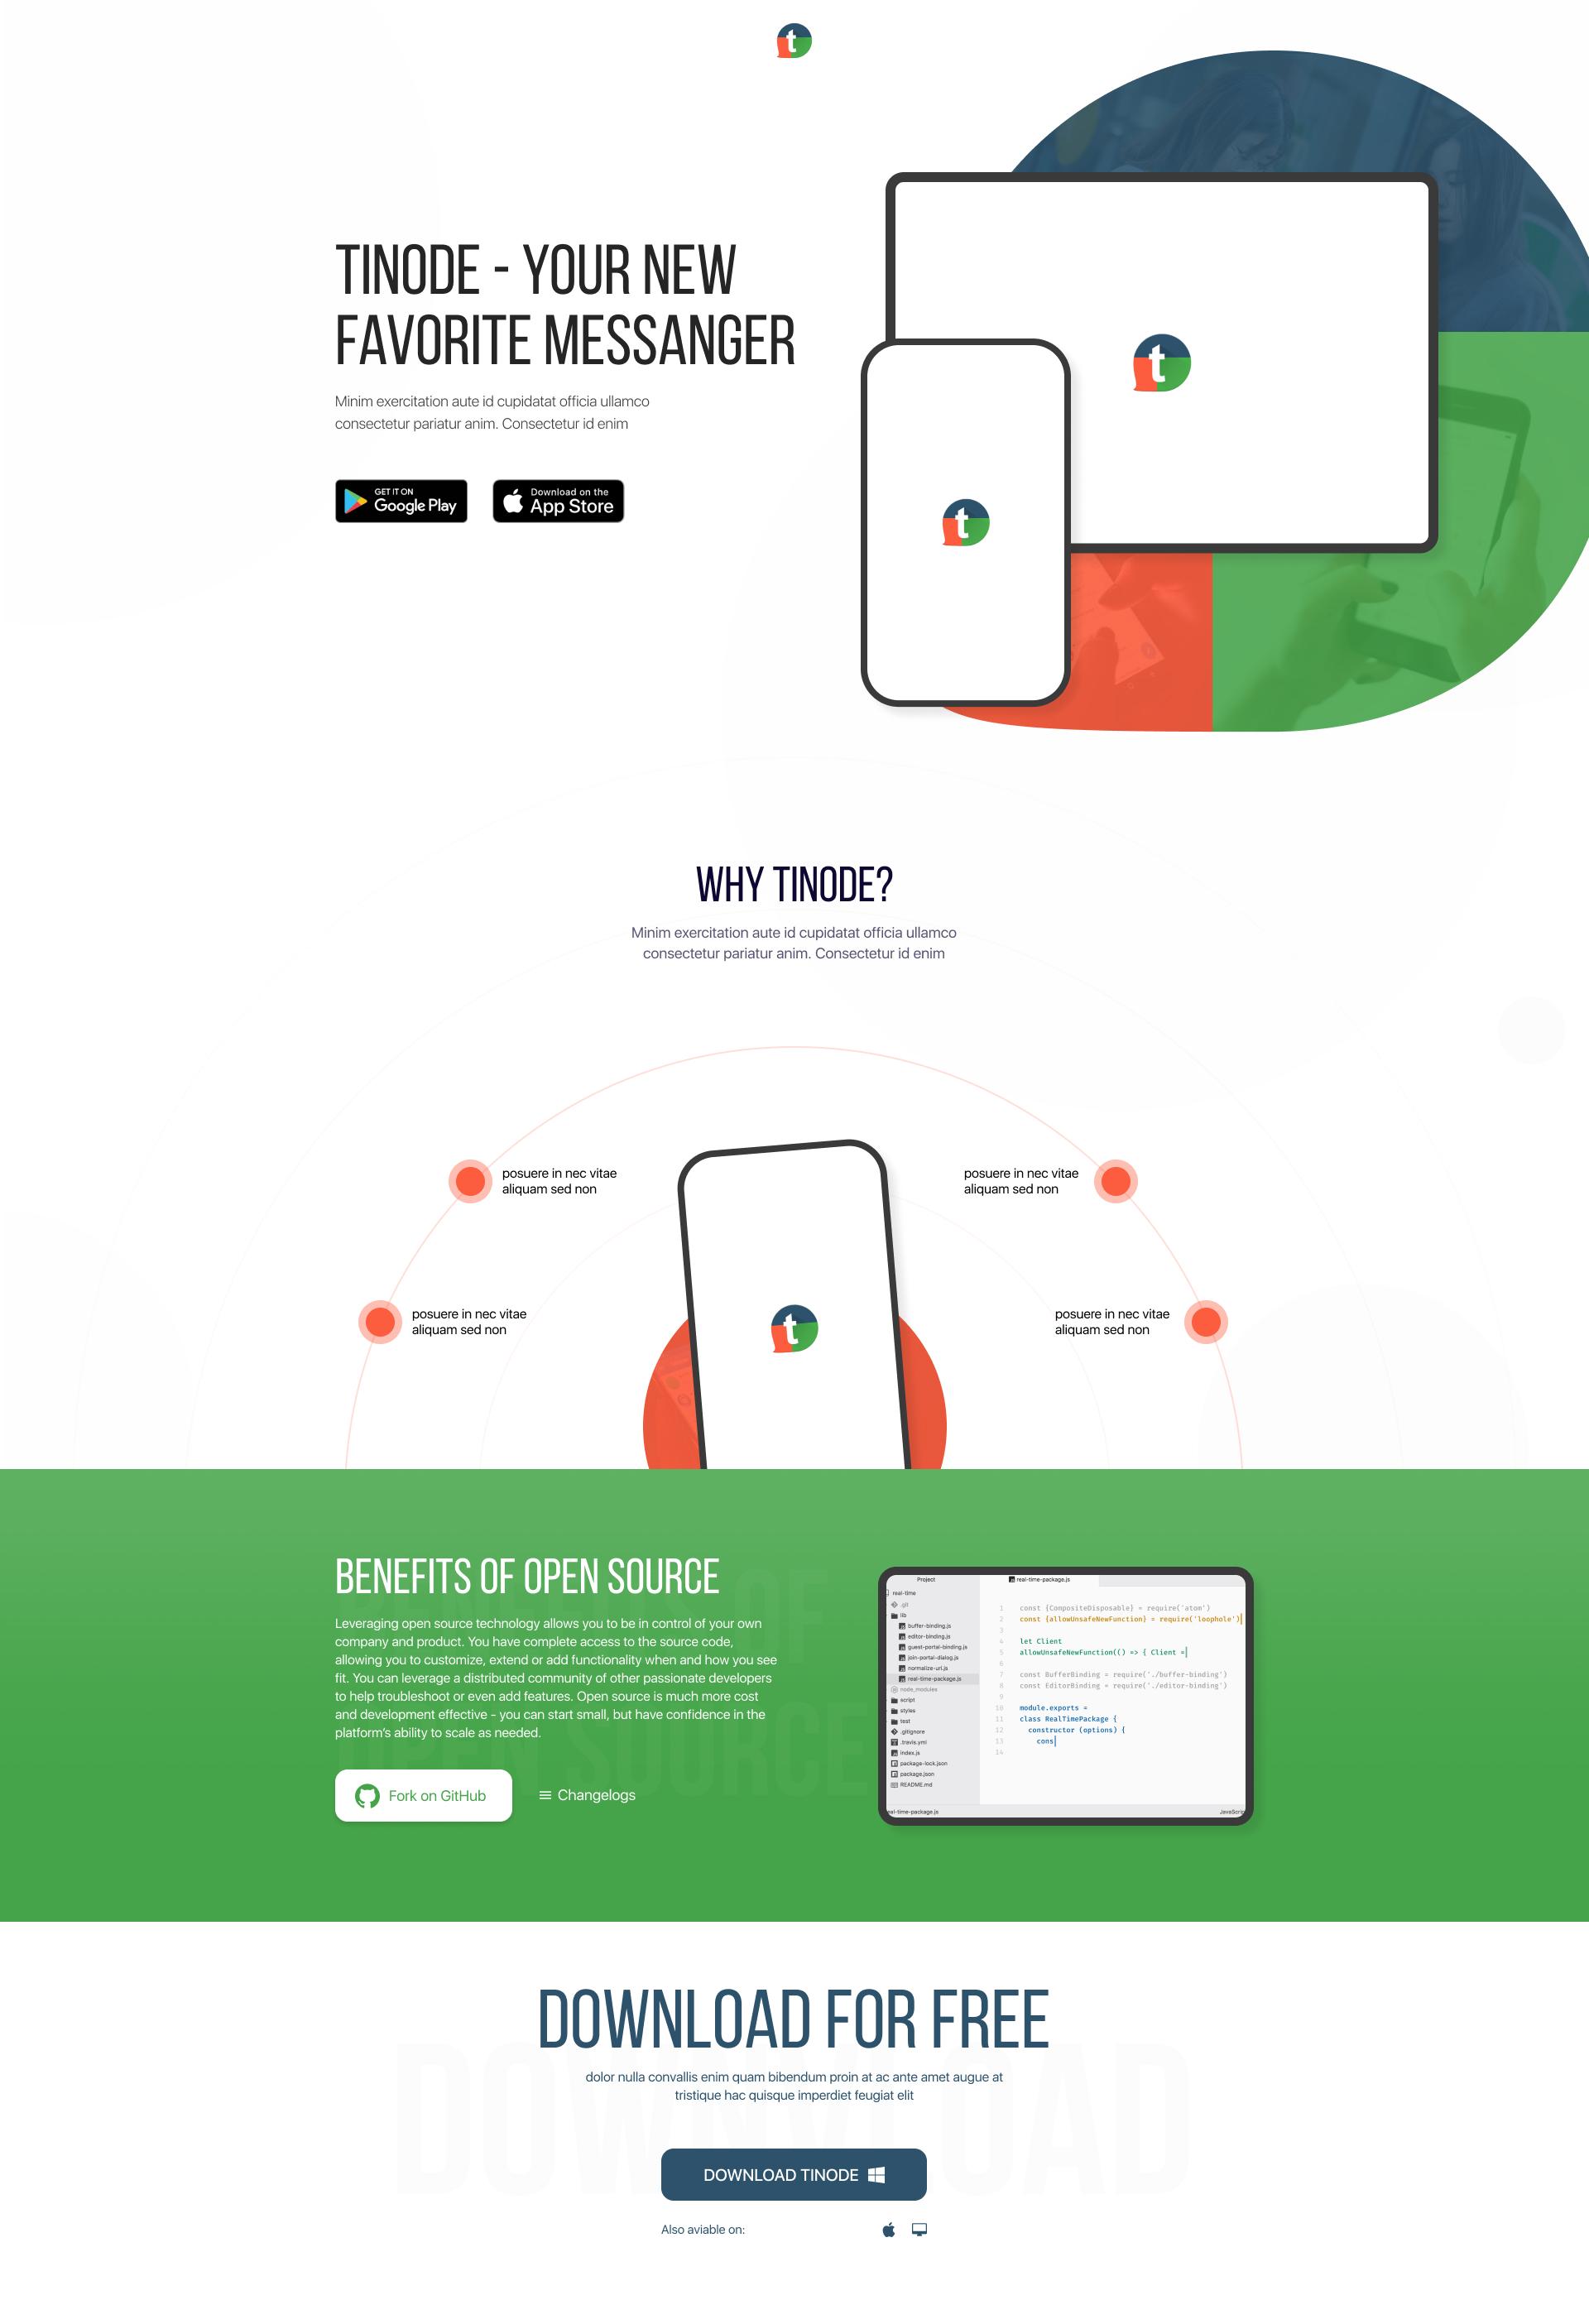 Дизайн сайта tinode.co фото f_0645d73cf889fce7.jpg